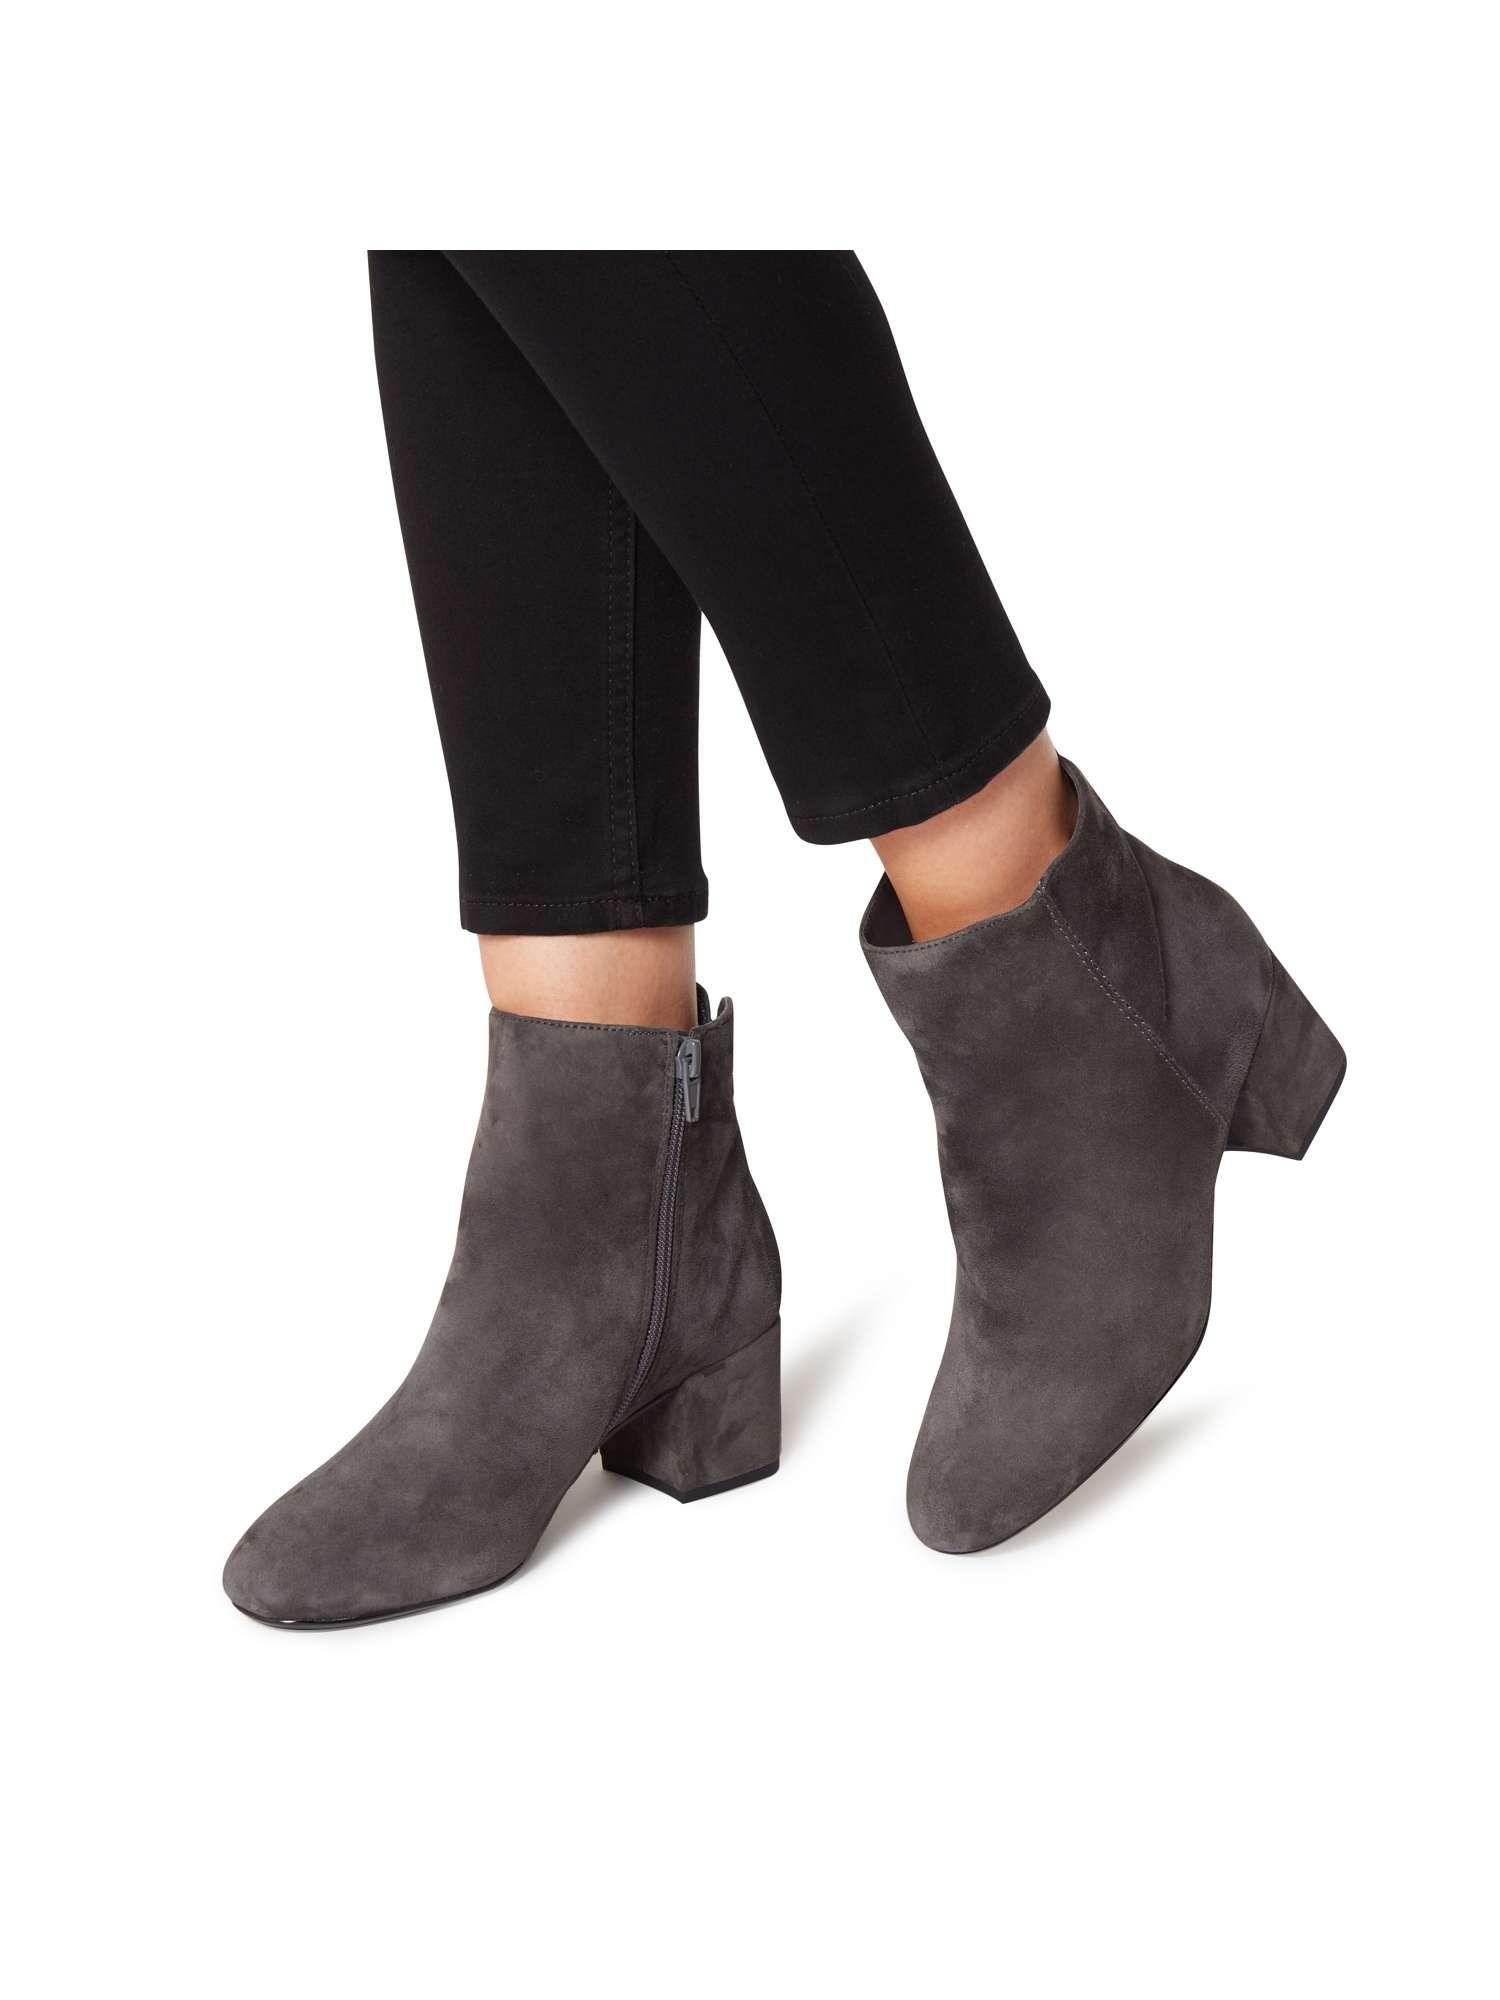 85d65be5146 Dune Olyvea Mid Block Heel Ankle Boots - House of Fraser ...